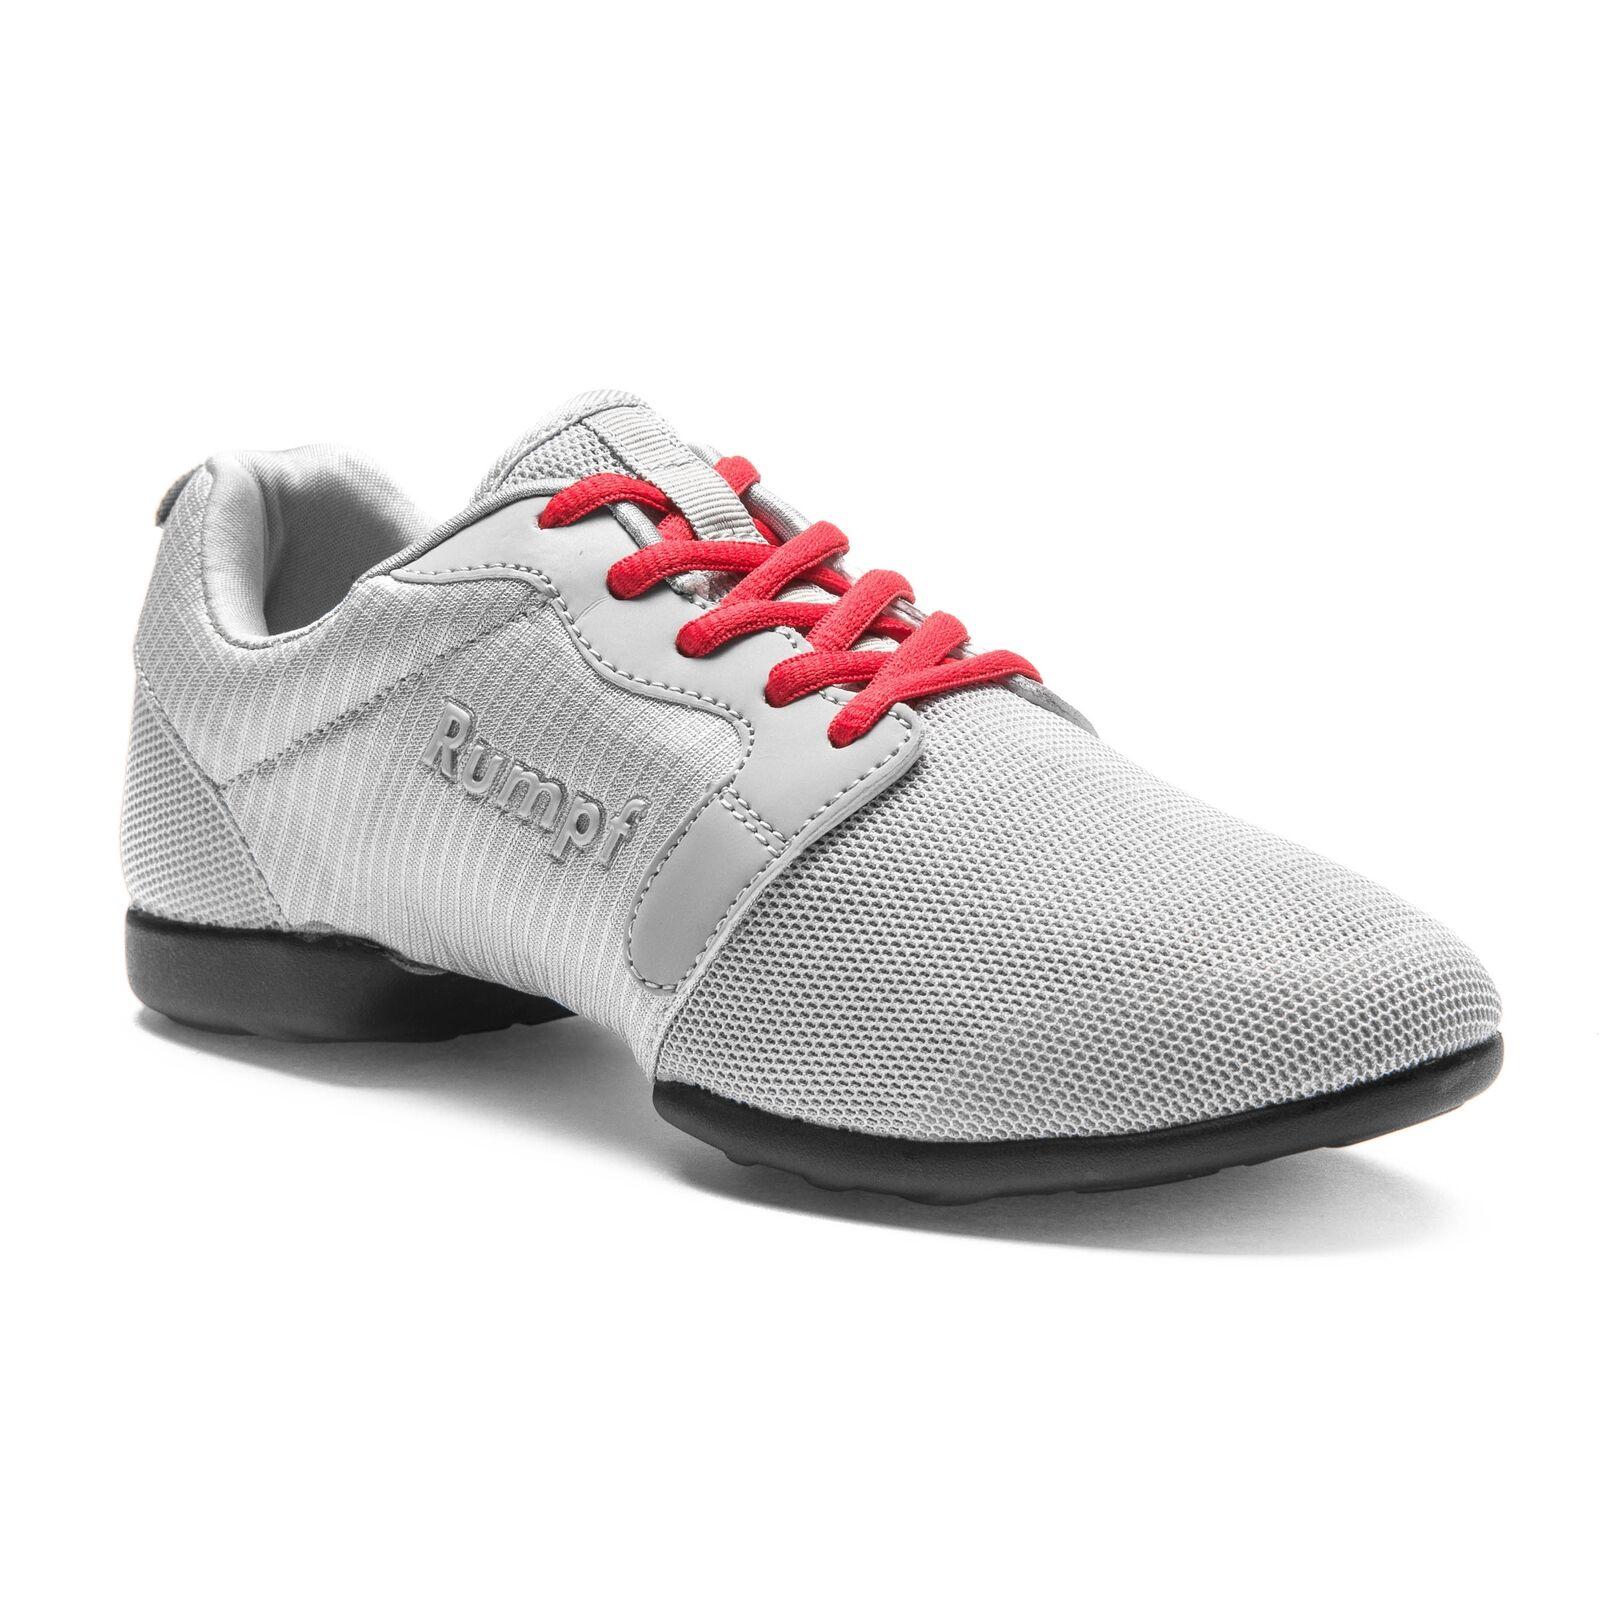 Rumpf Mojo Dance Lindy Hop Swing Tanz Trainings Schuh grau rote Schnürsenkel